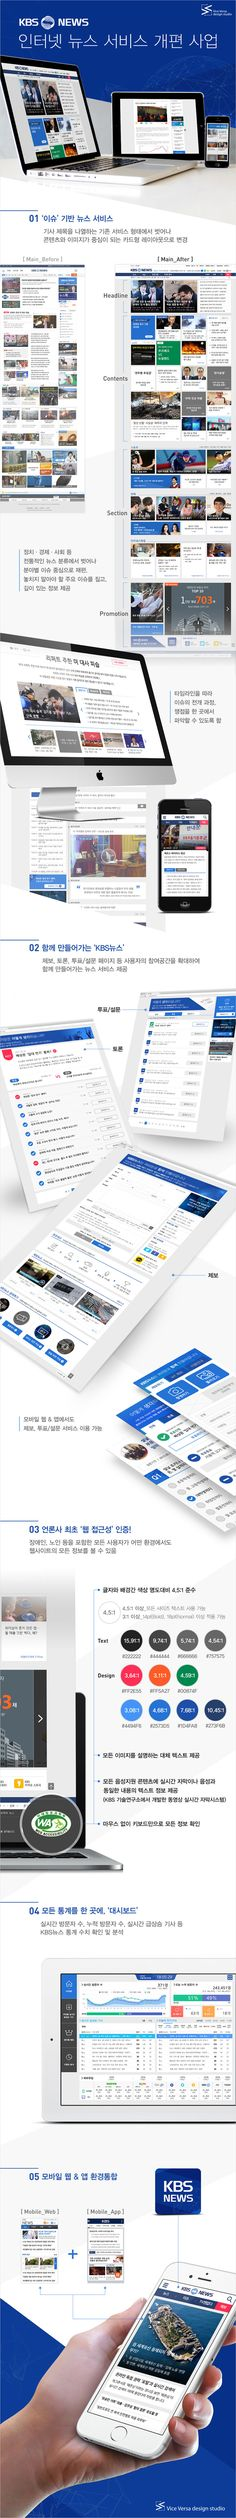 [Web & Mobile] KBS 인터넷 뉴스 서비스 개편 사업(기획 및 디자인)